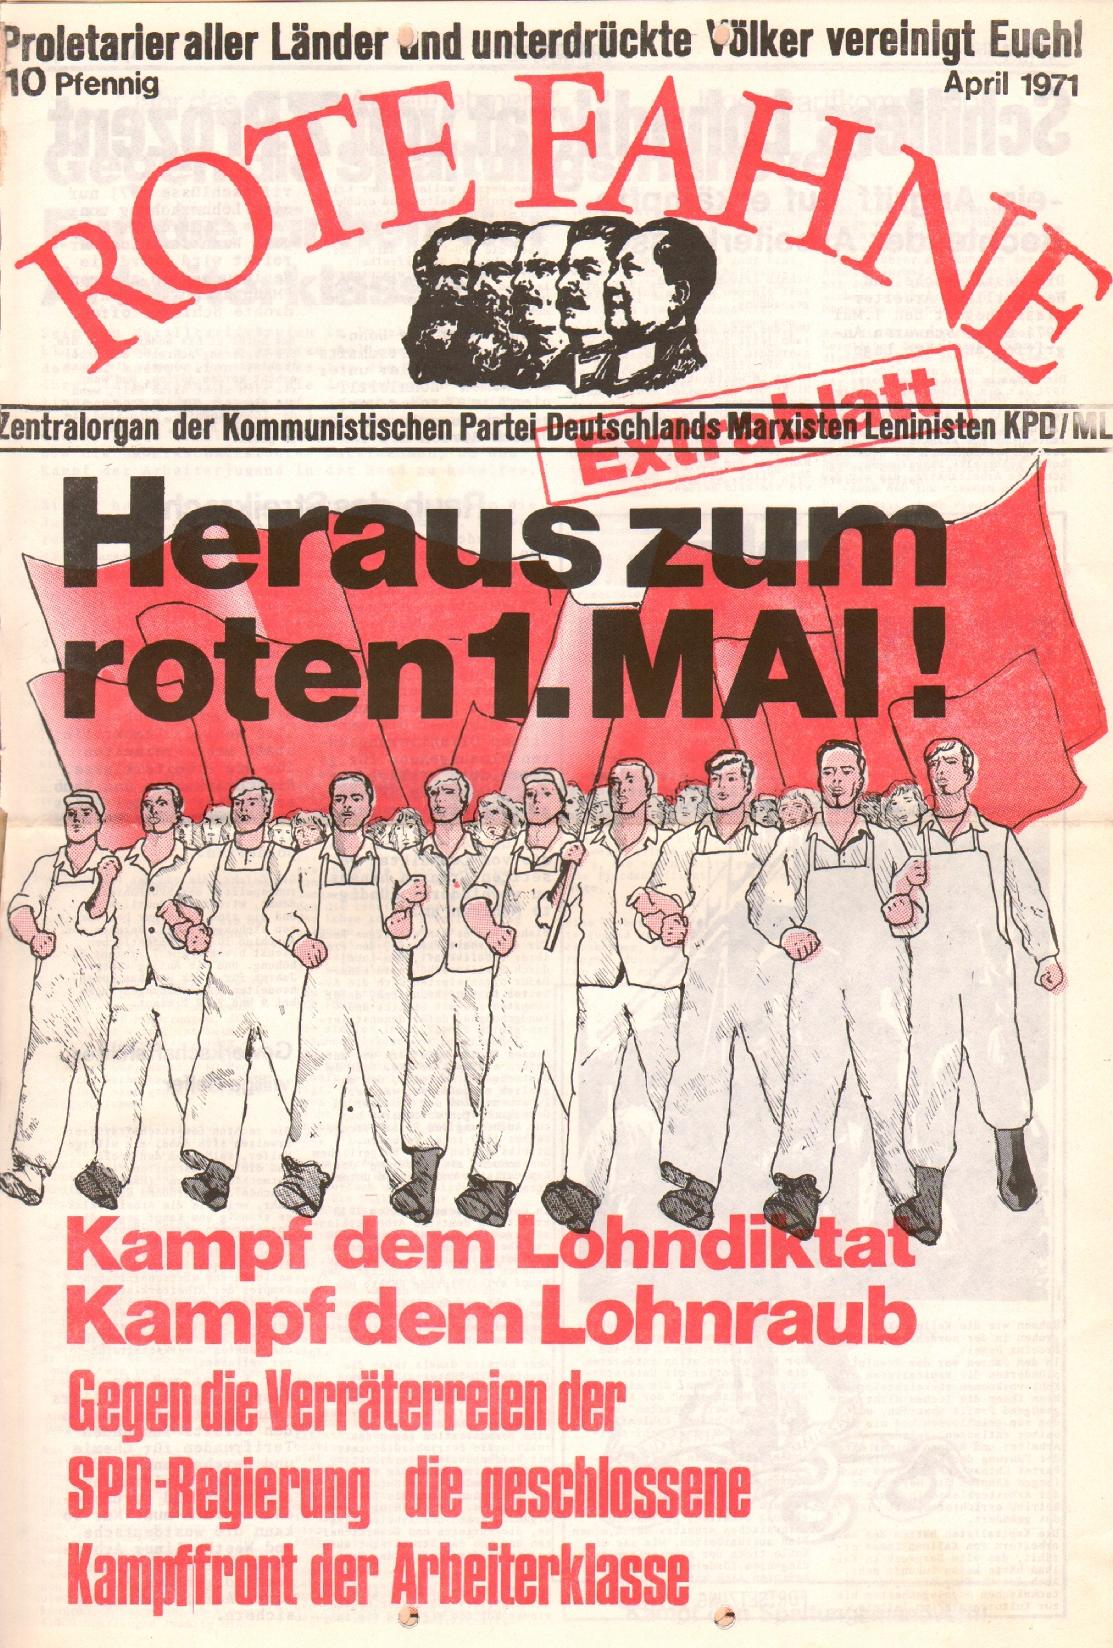 Rote Fahne, 2. Jg., April 1971, Extrablatt, Seite 1